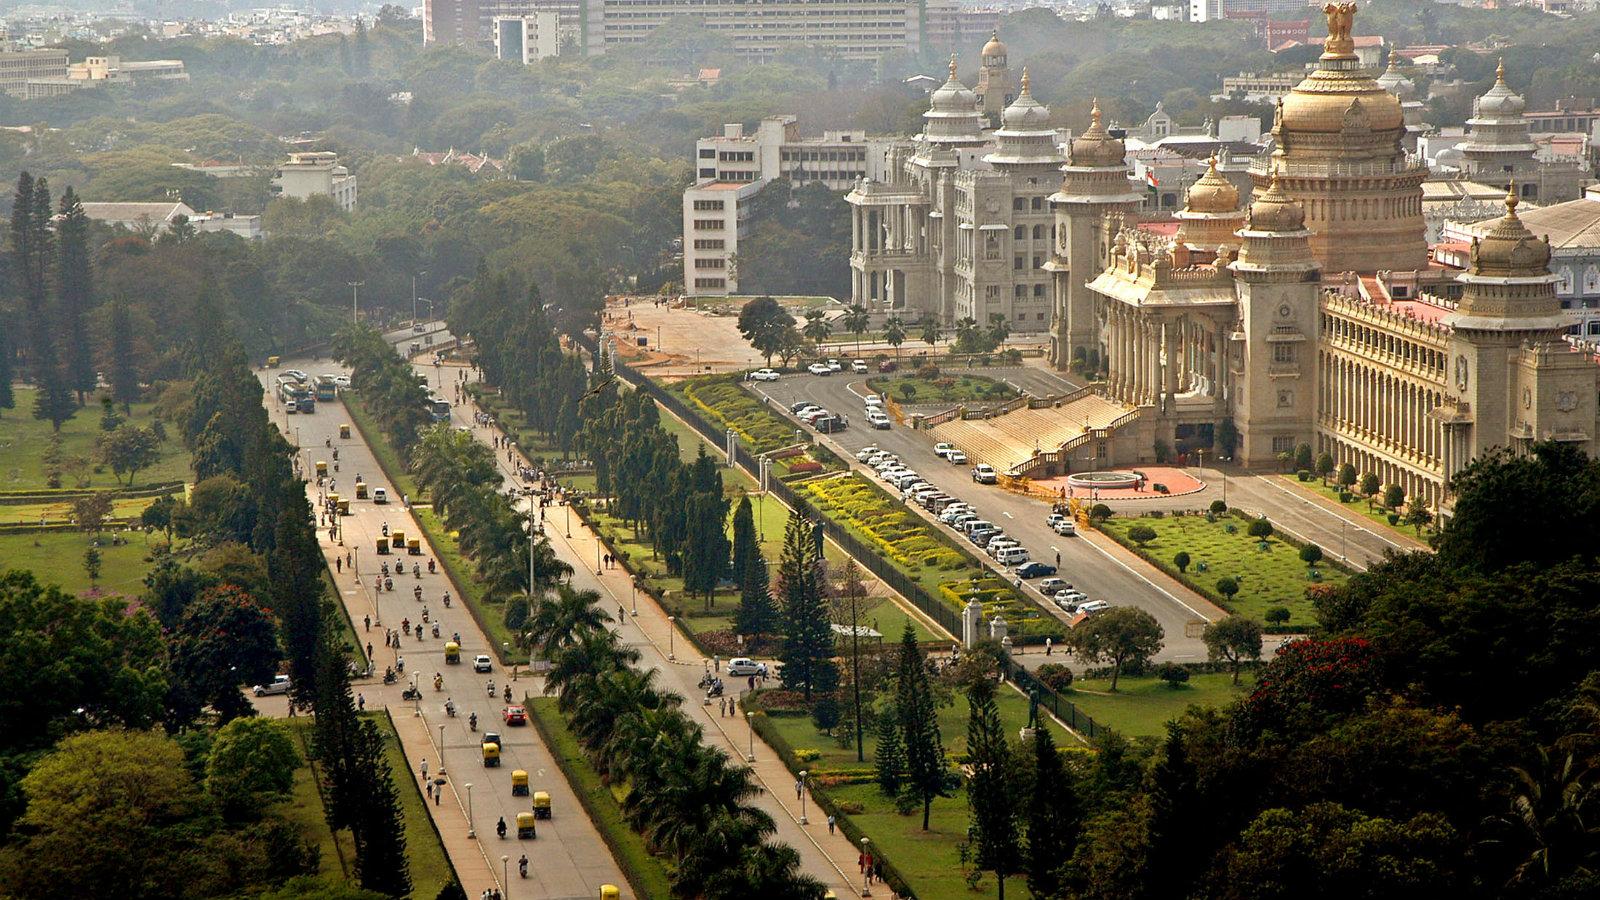 Bangalore turns Bengaluru: The birth, life, and descent into